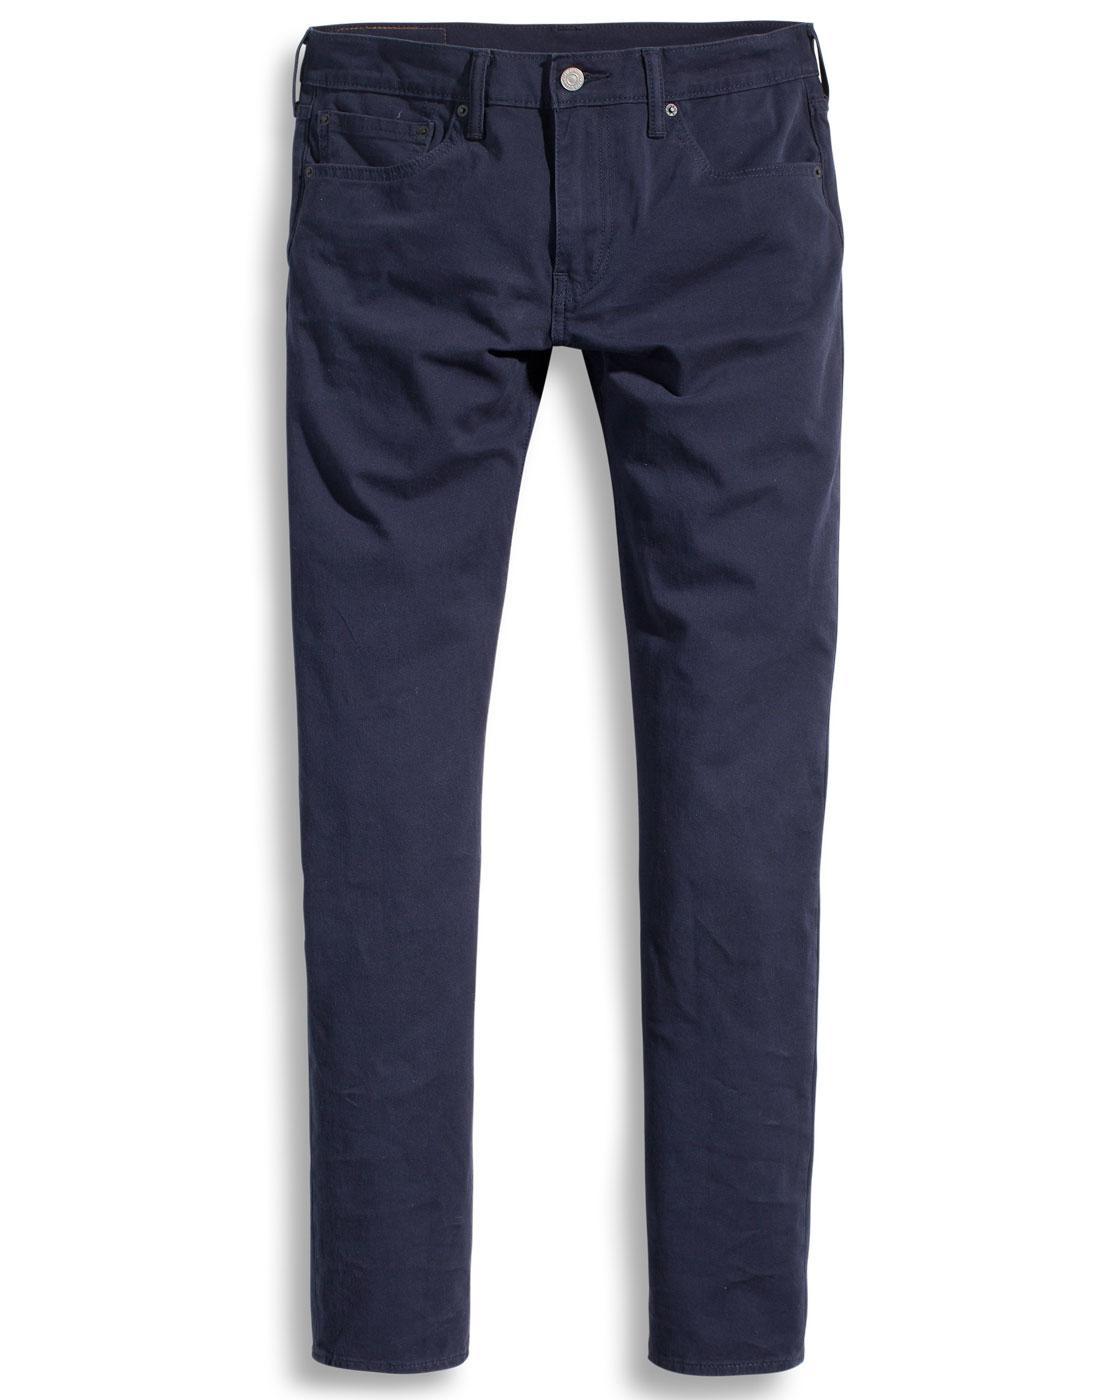 LEVI'S 511 Retro Slim Fit Chinos NIGHTWATCH  BLUE